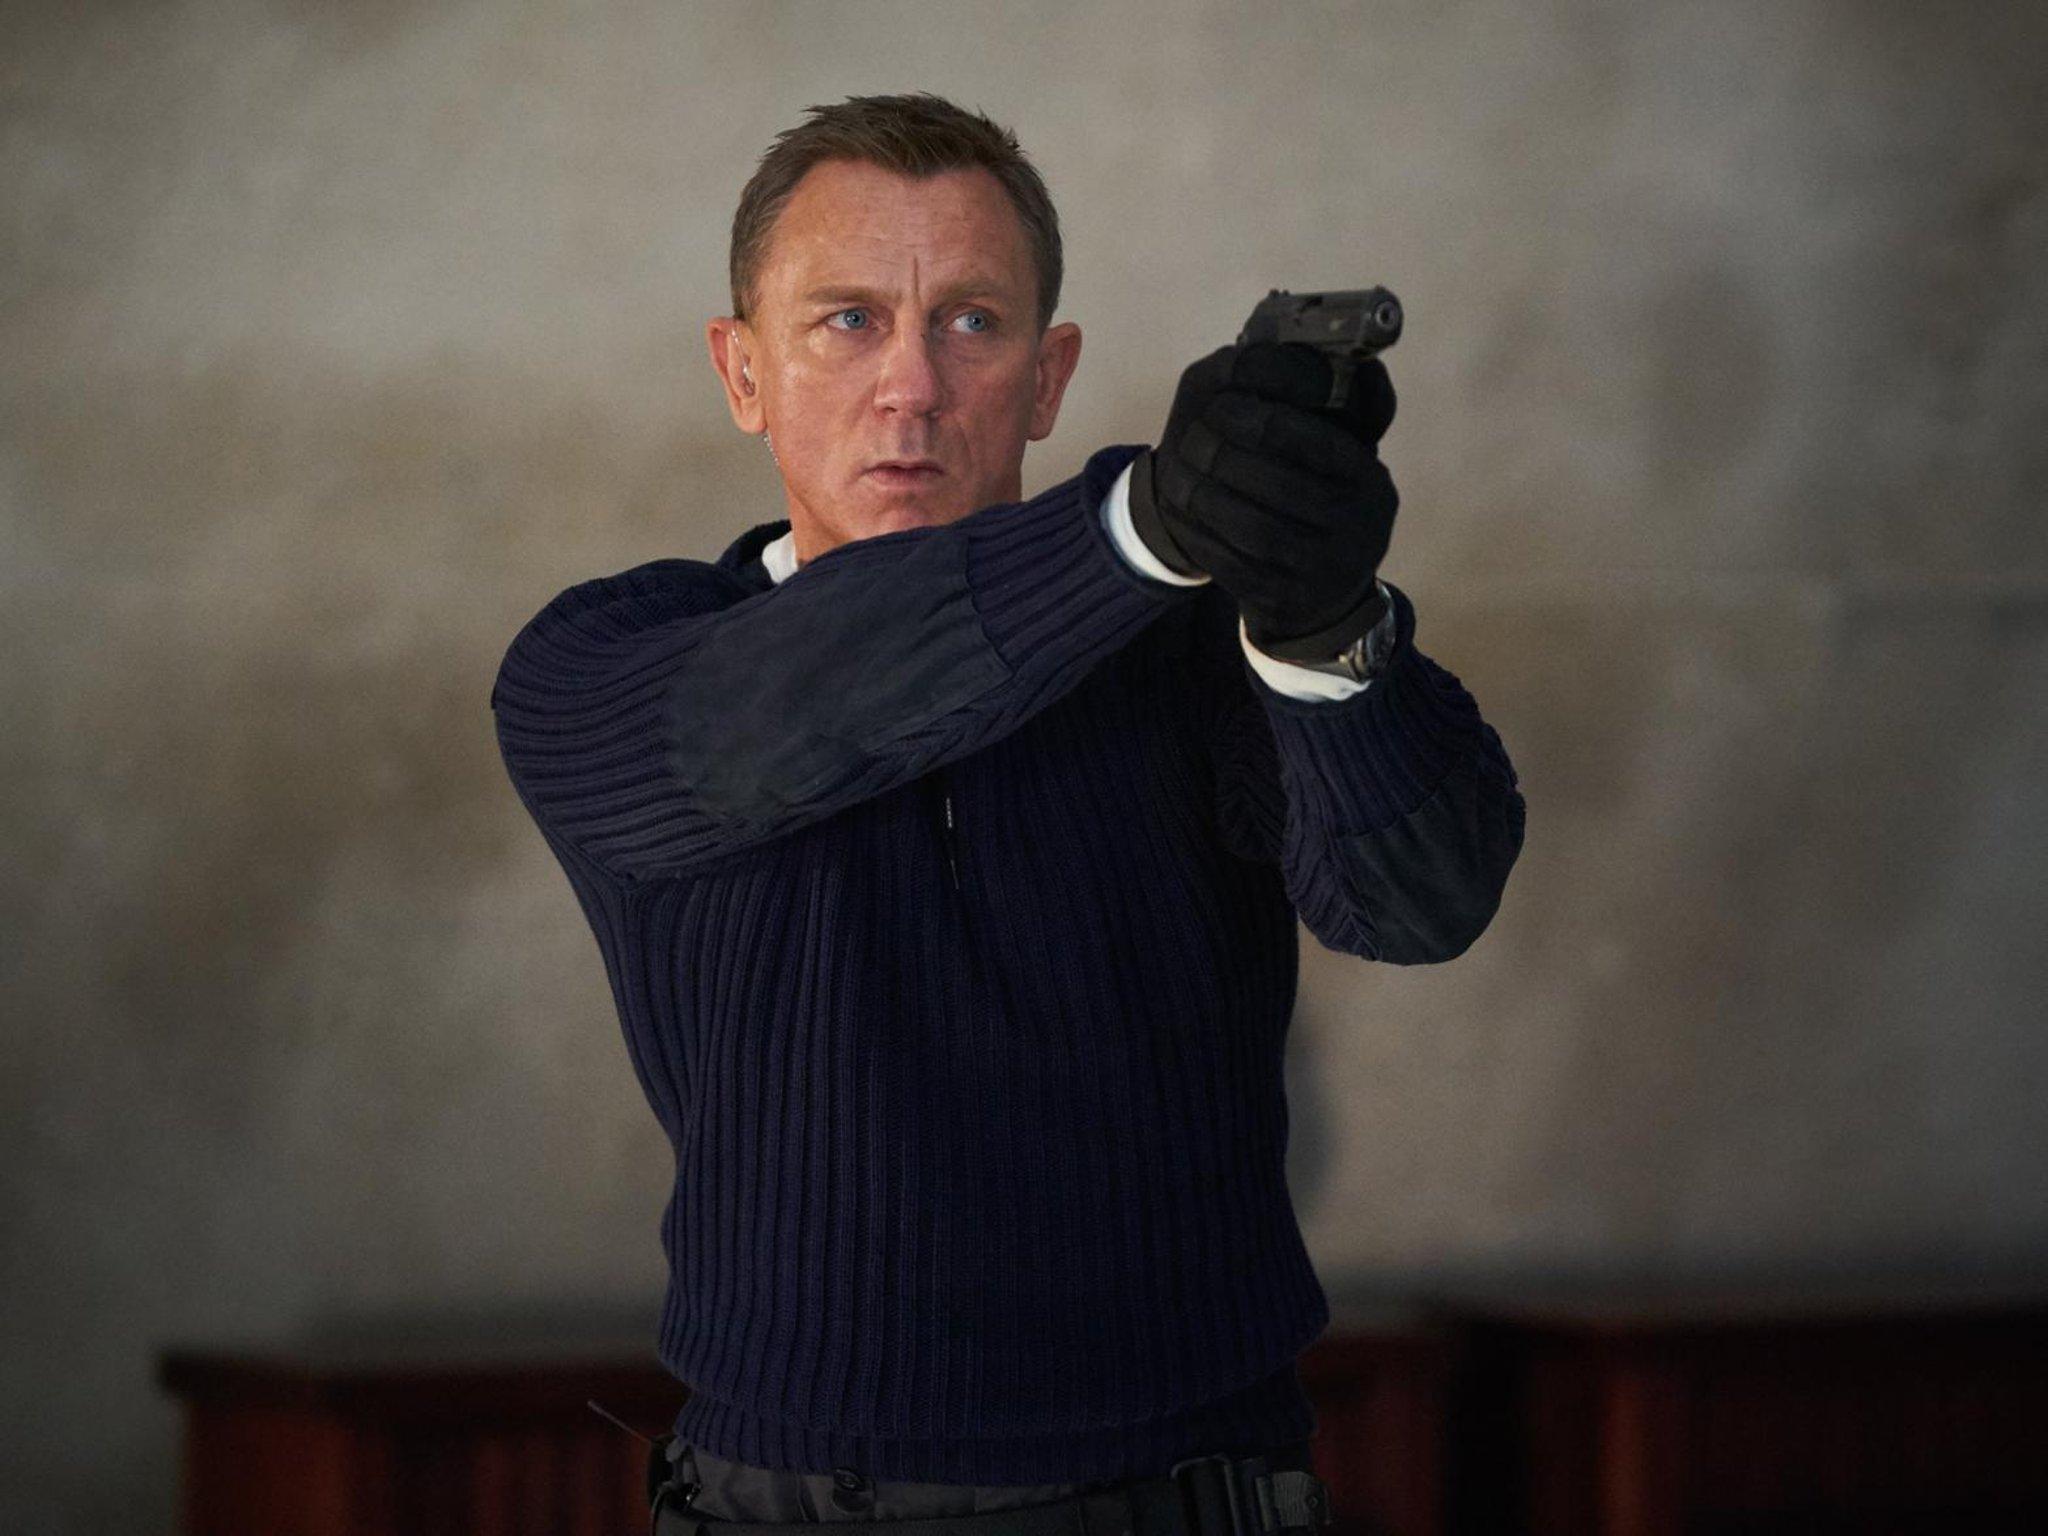 Week Forward: James Bond movie No Time To Die in cinemas, Rathlin Power plan in East Yorkshire, Natasha's Legislation and the London Marathon